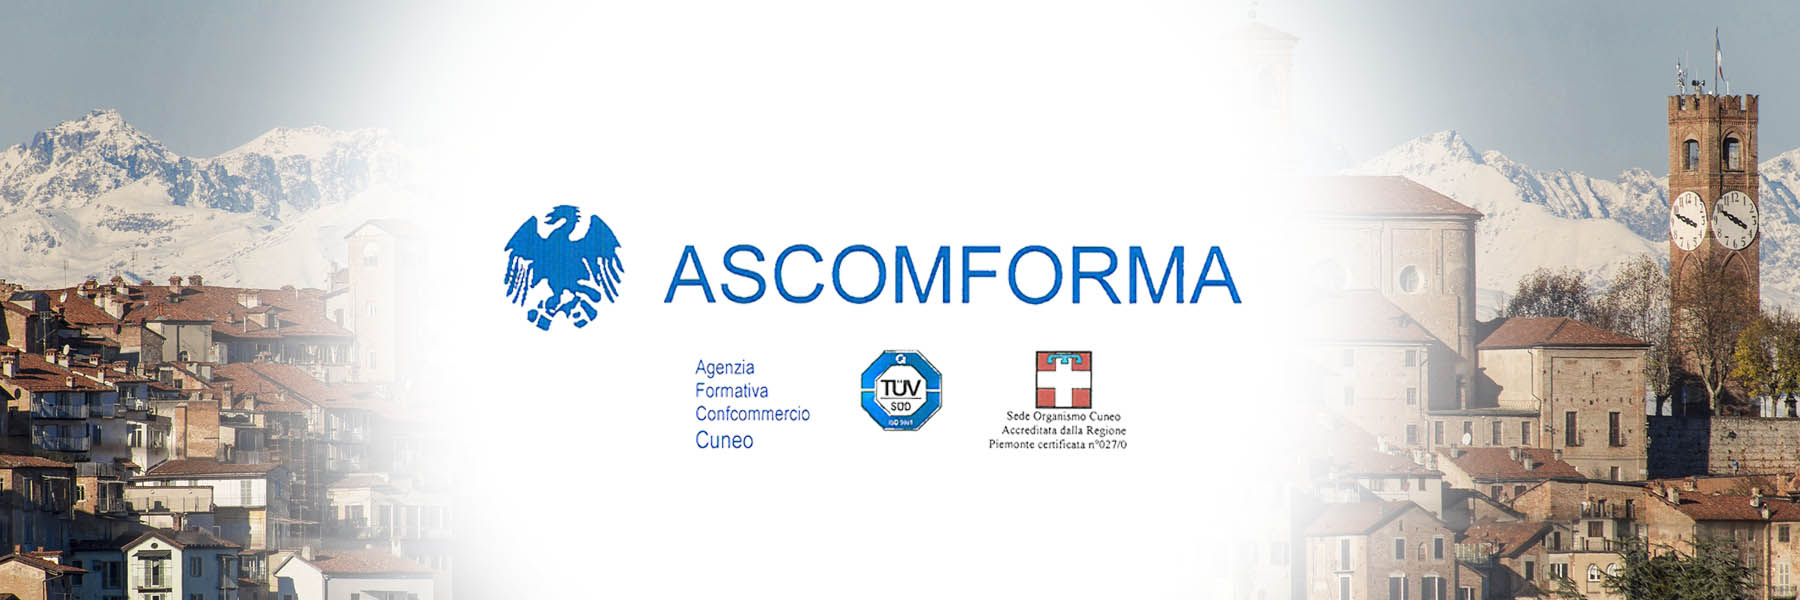 ascomforma